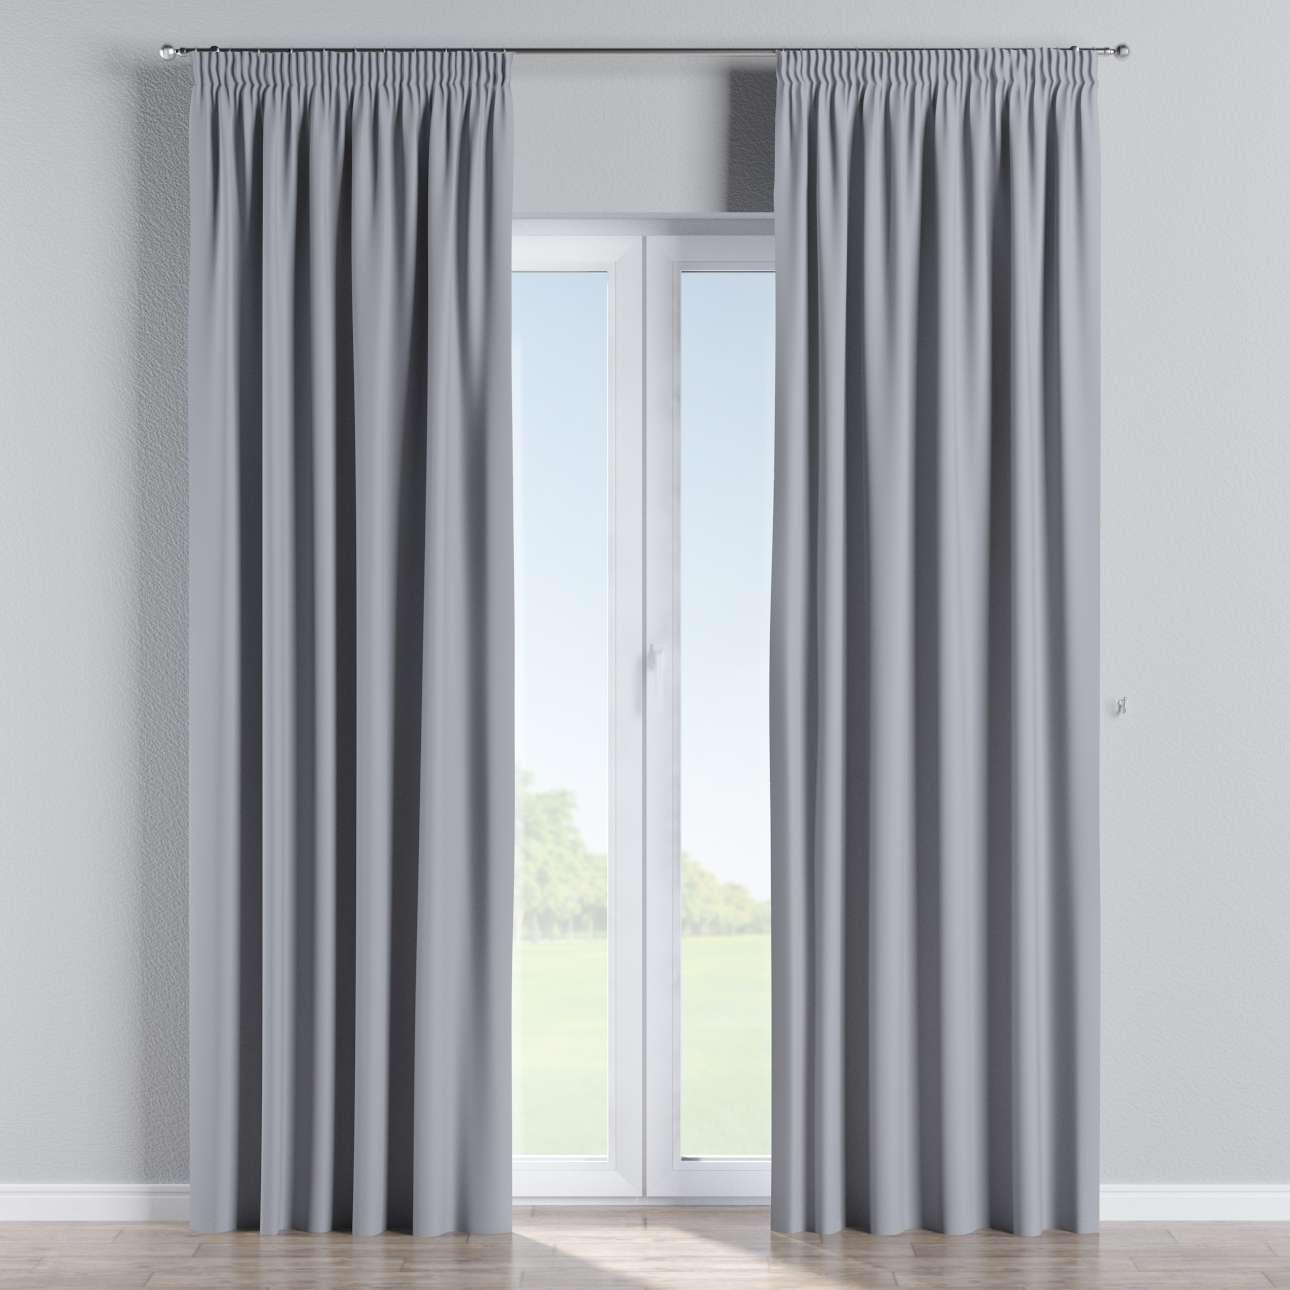 verdunklungsvorhang mit kr uselband hellgrau dekoria. Black Bedroom Furniture Sets. Home Design Ideas